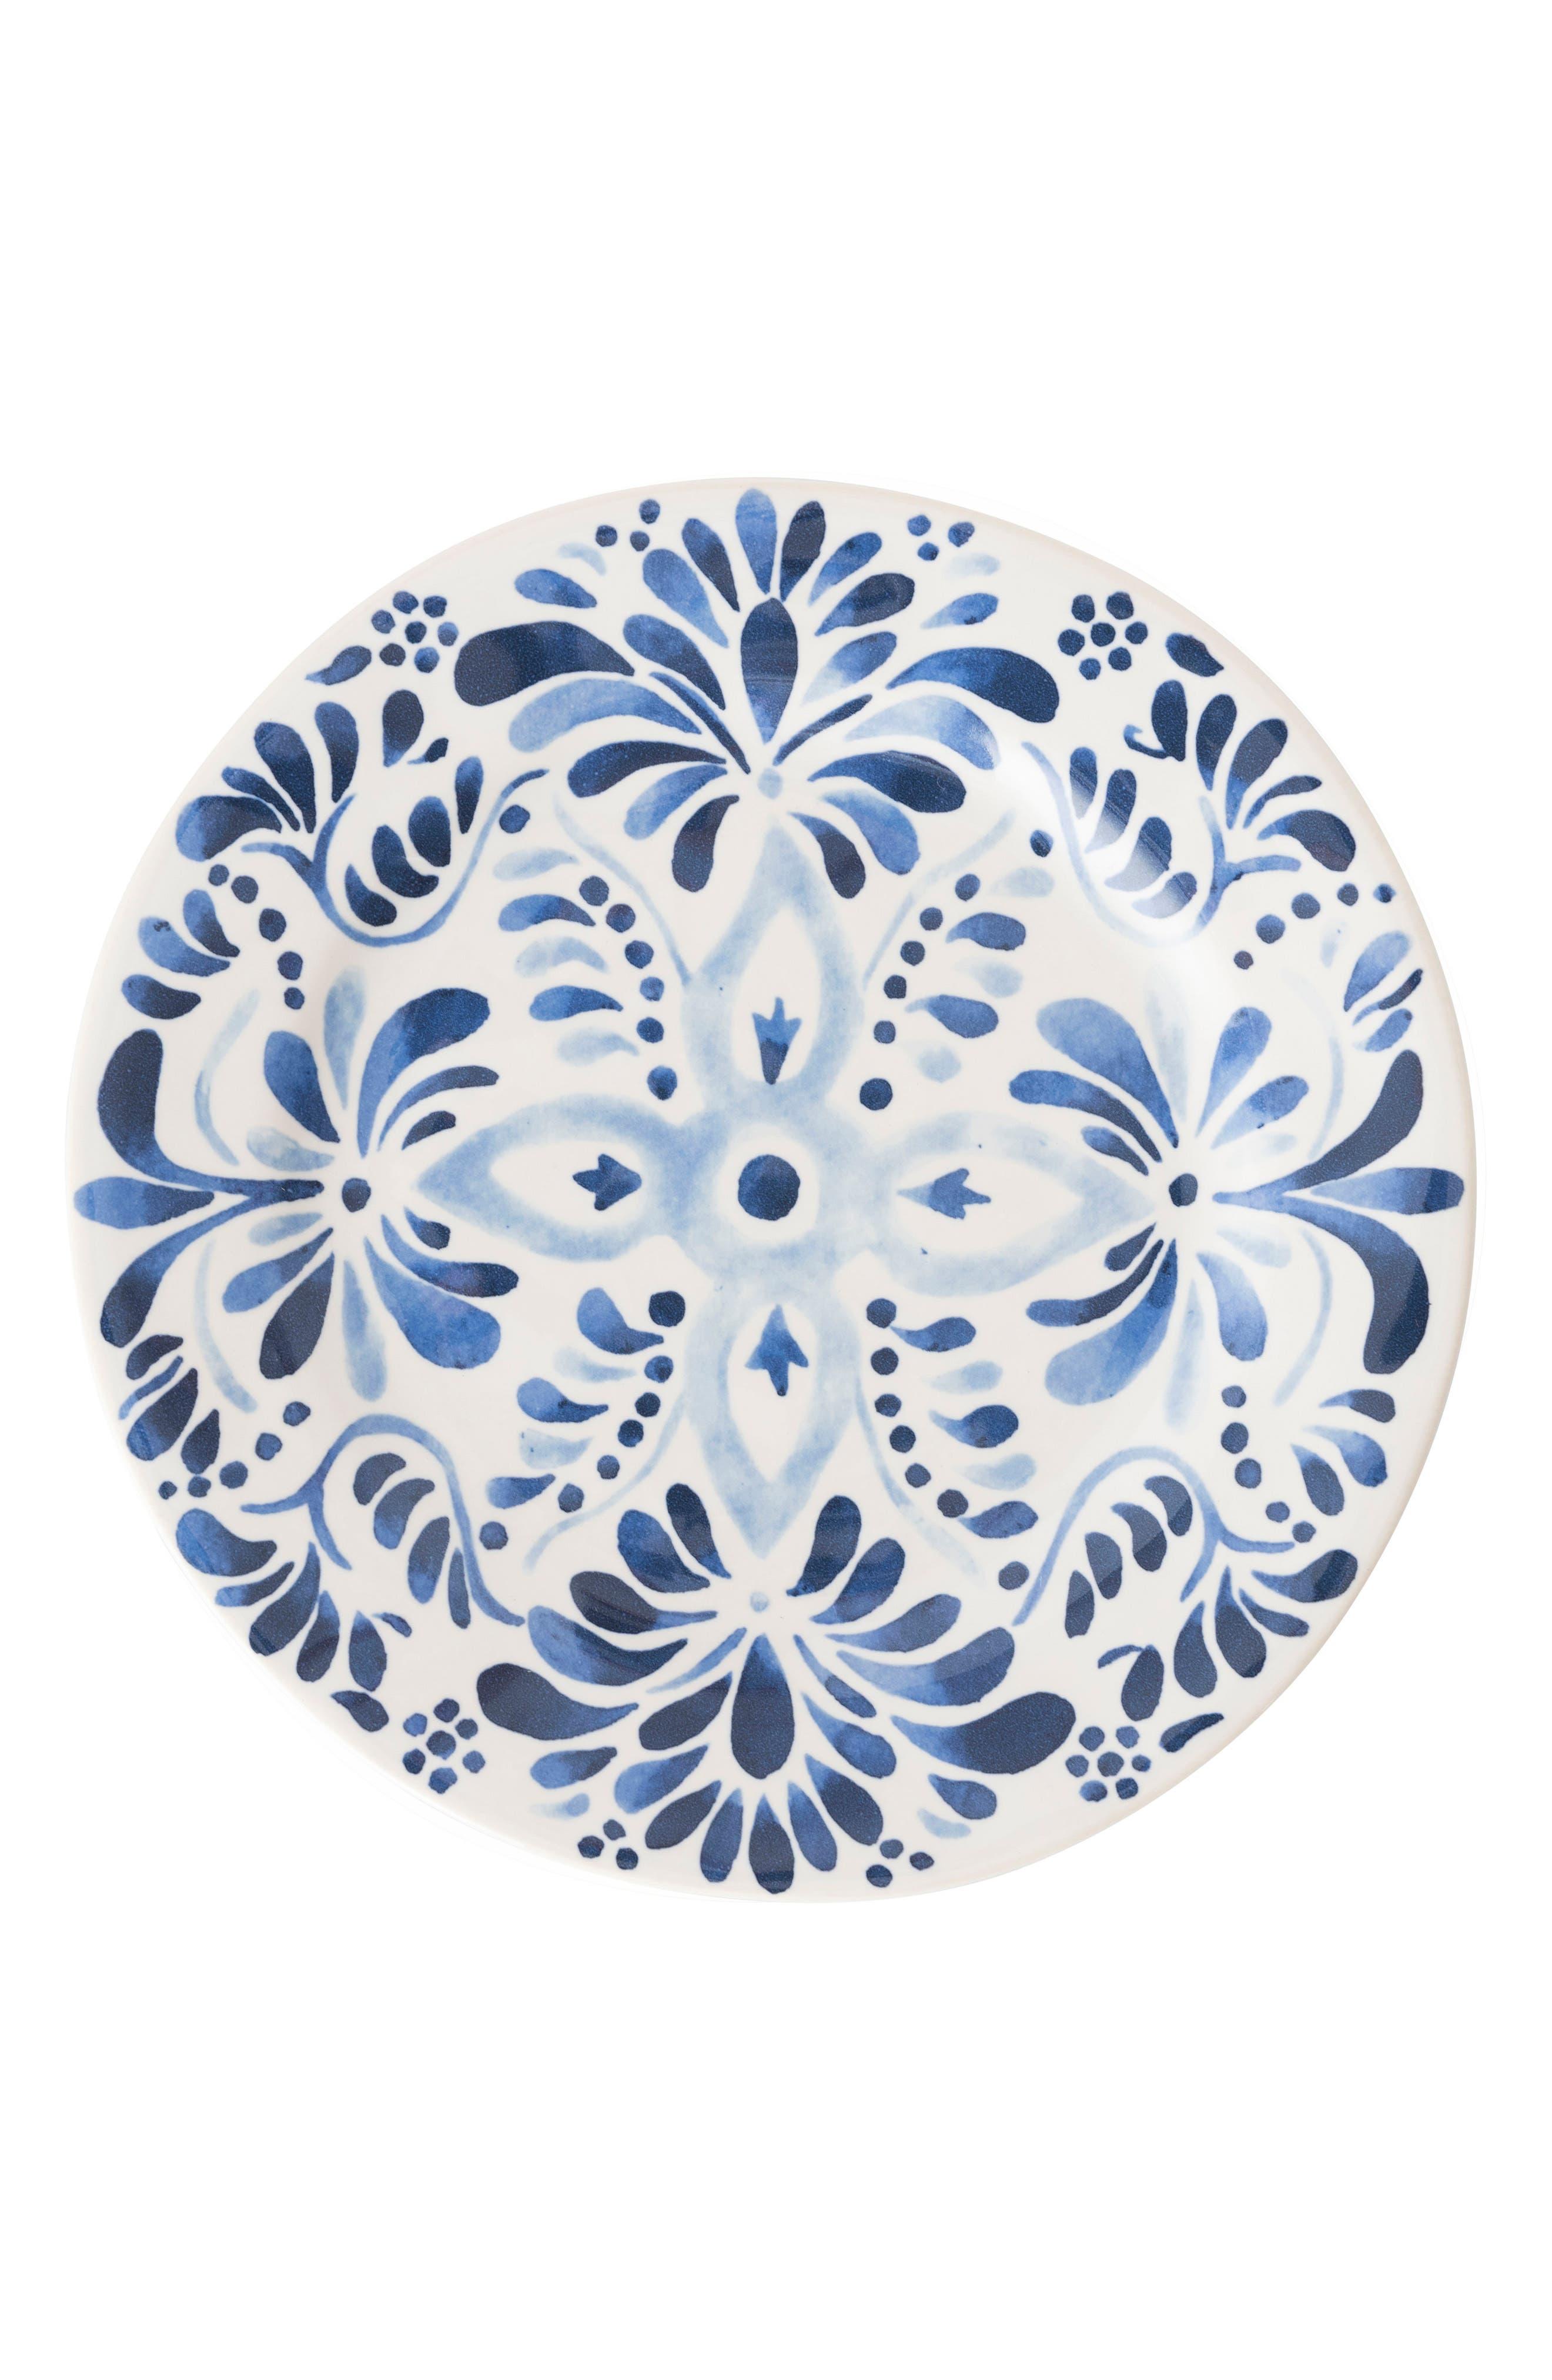 Juliska Wanderlust Collection - Iberian Journey Ceramic Salad/Dessert Plate